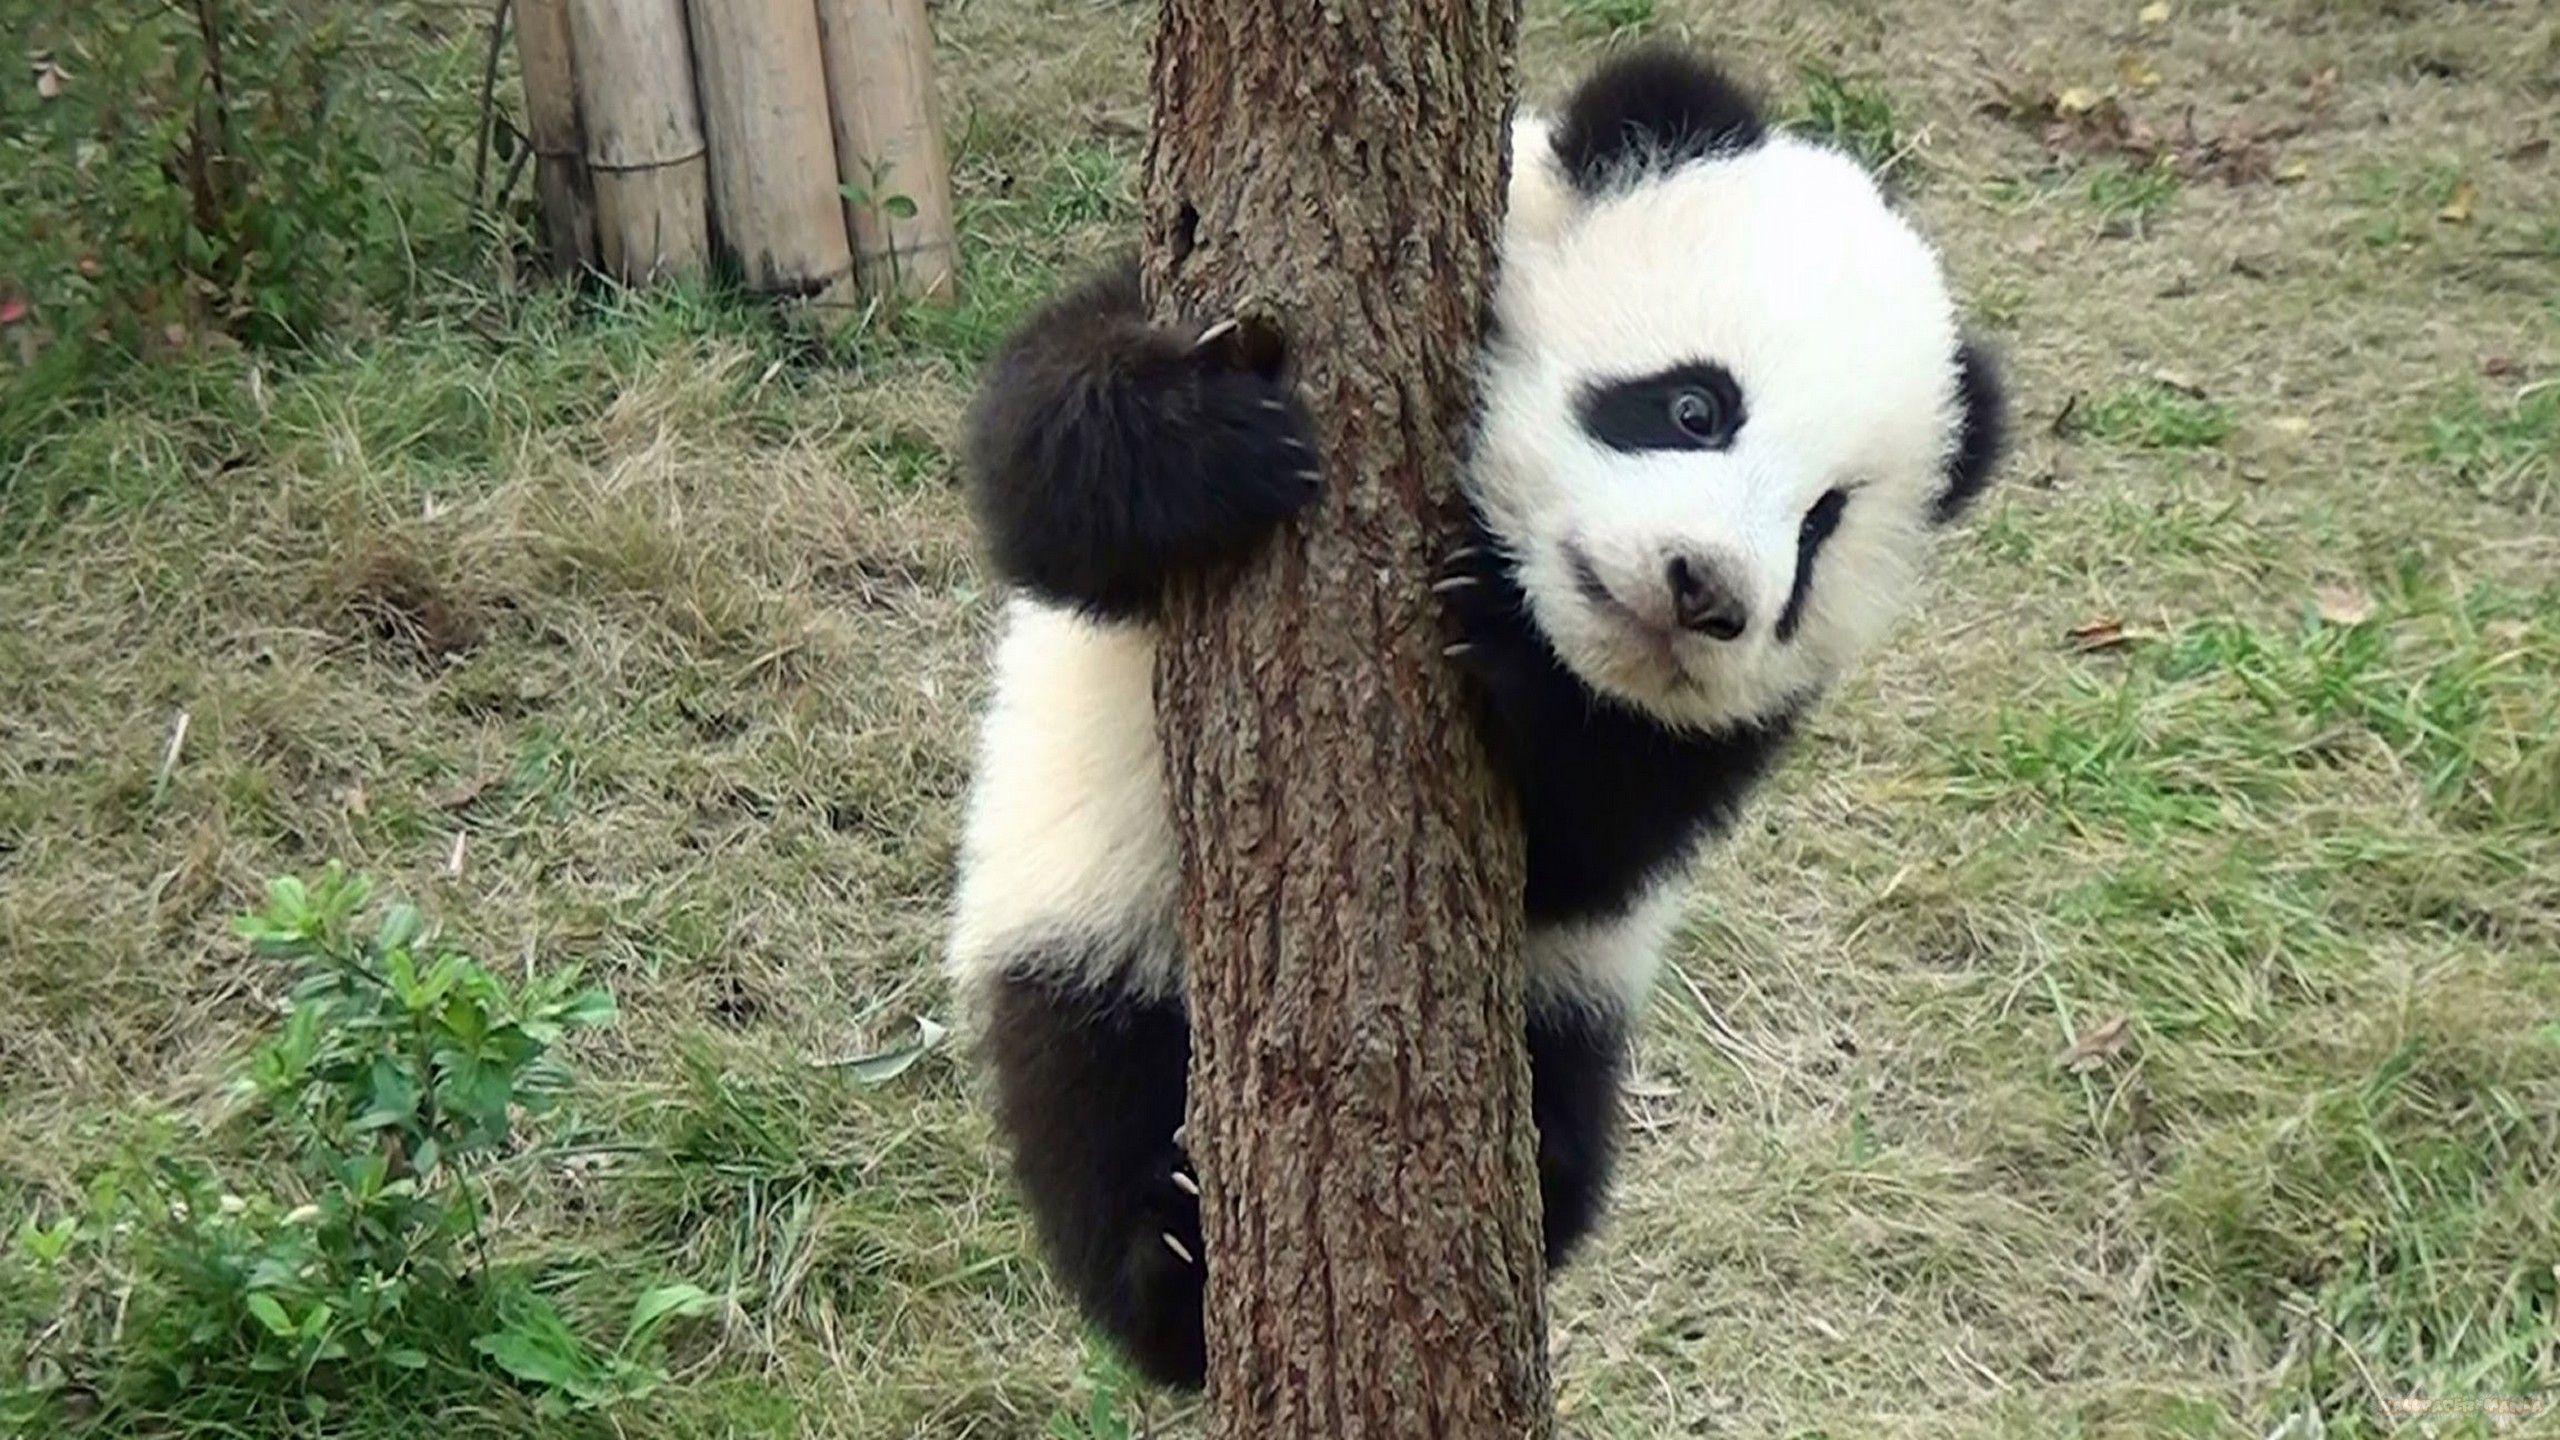 5k Hd Panda Wallpapers Top Free 5k Hd Panda Backgrounds